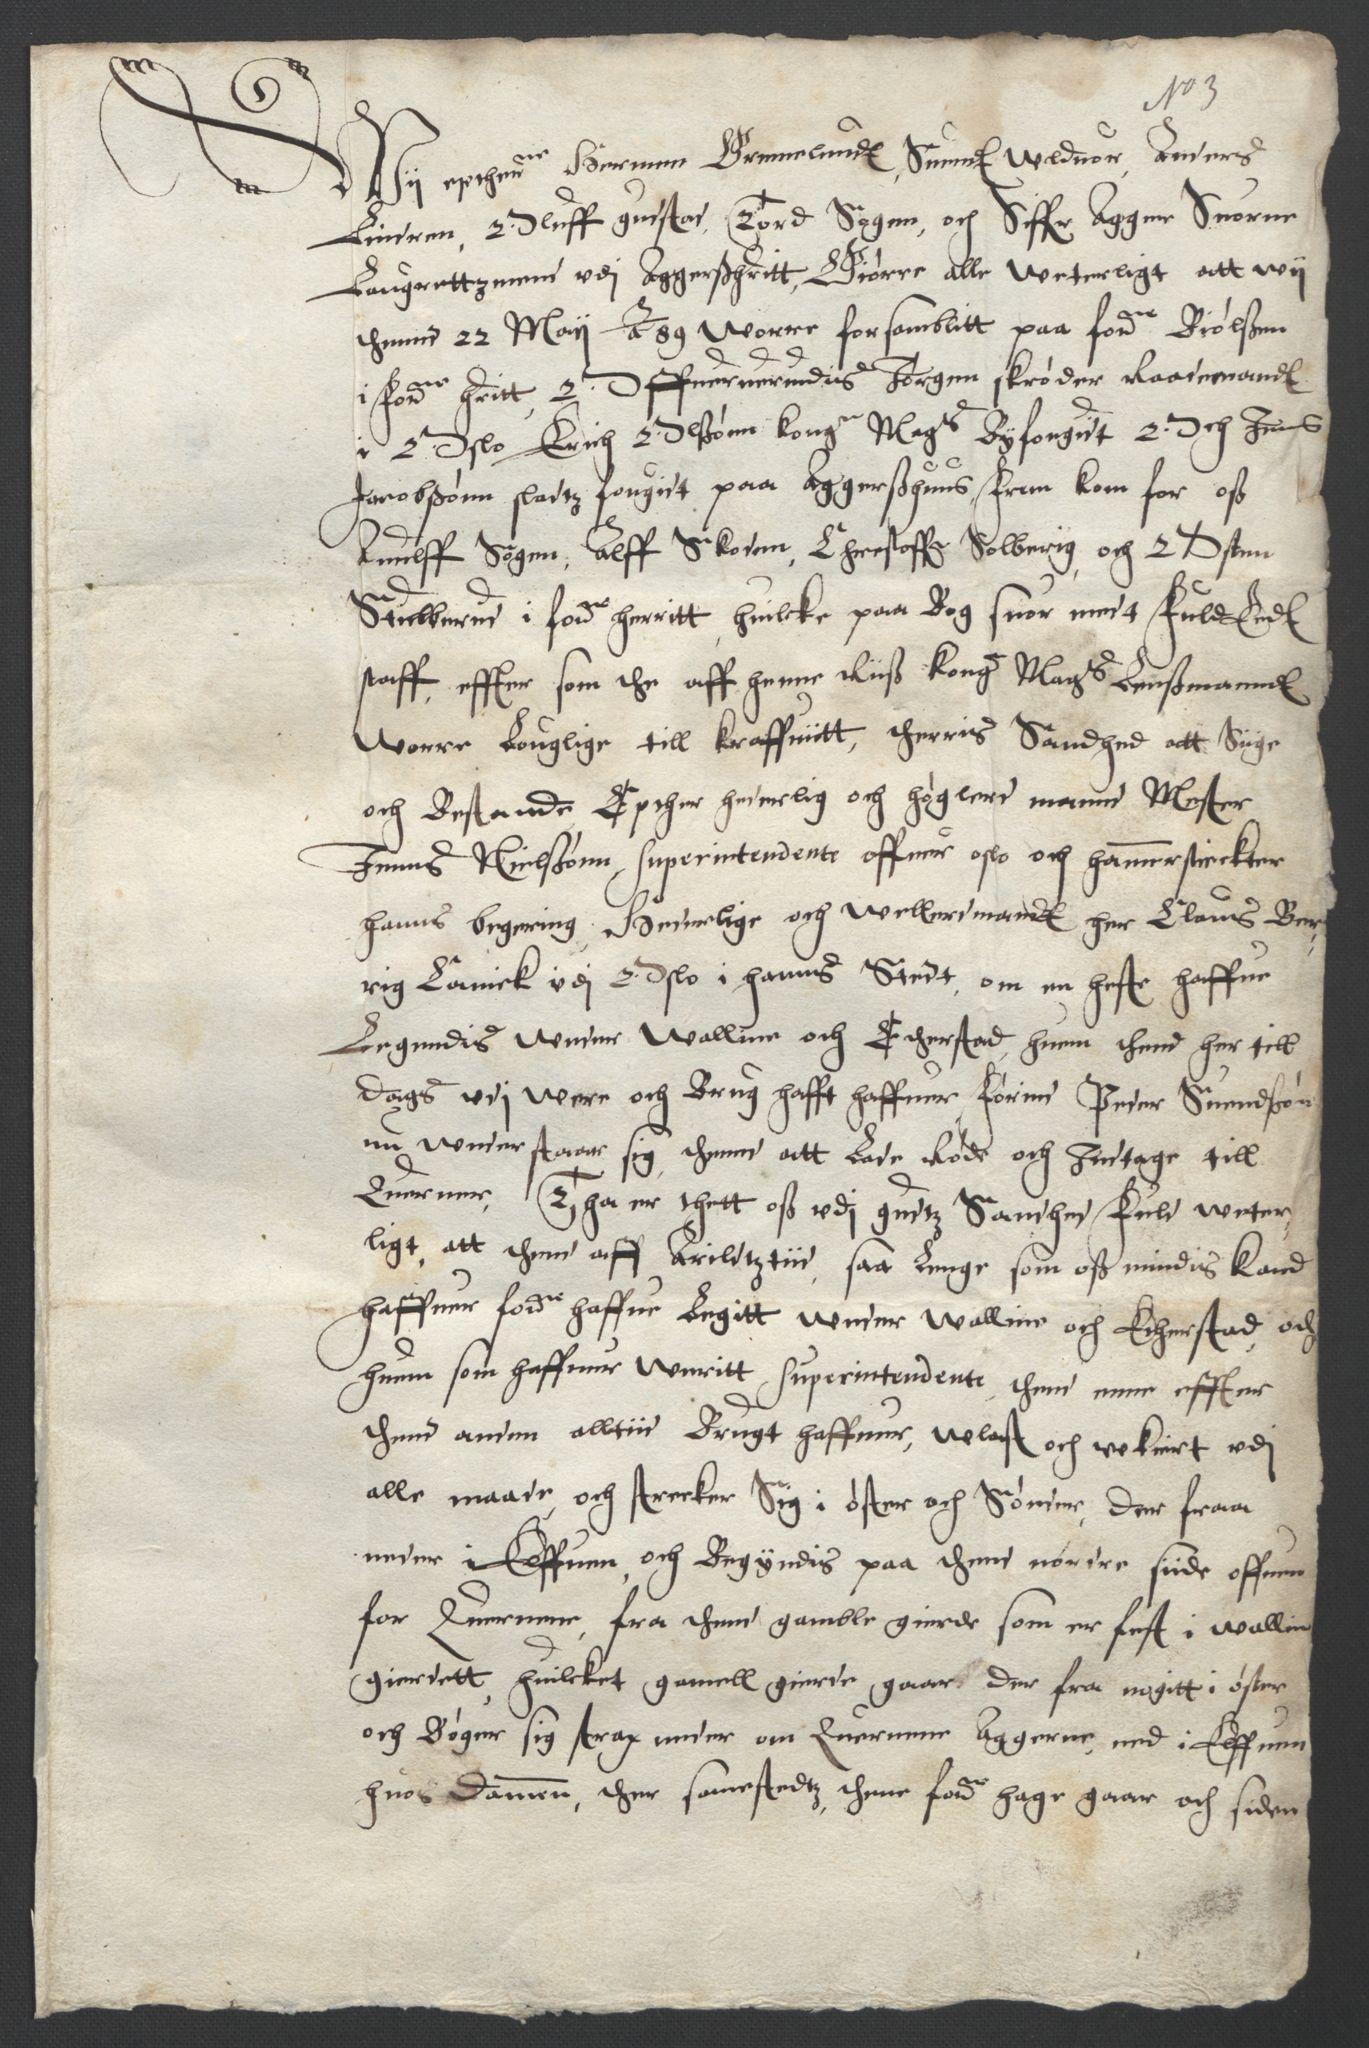 SAO, Oslo stiftsdireksjon, G/Gb/L0001: Bispestolens dokumenter, 1584-1612, s. 3